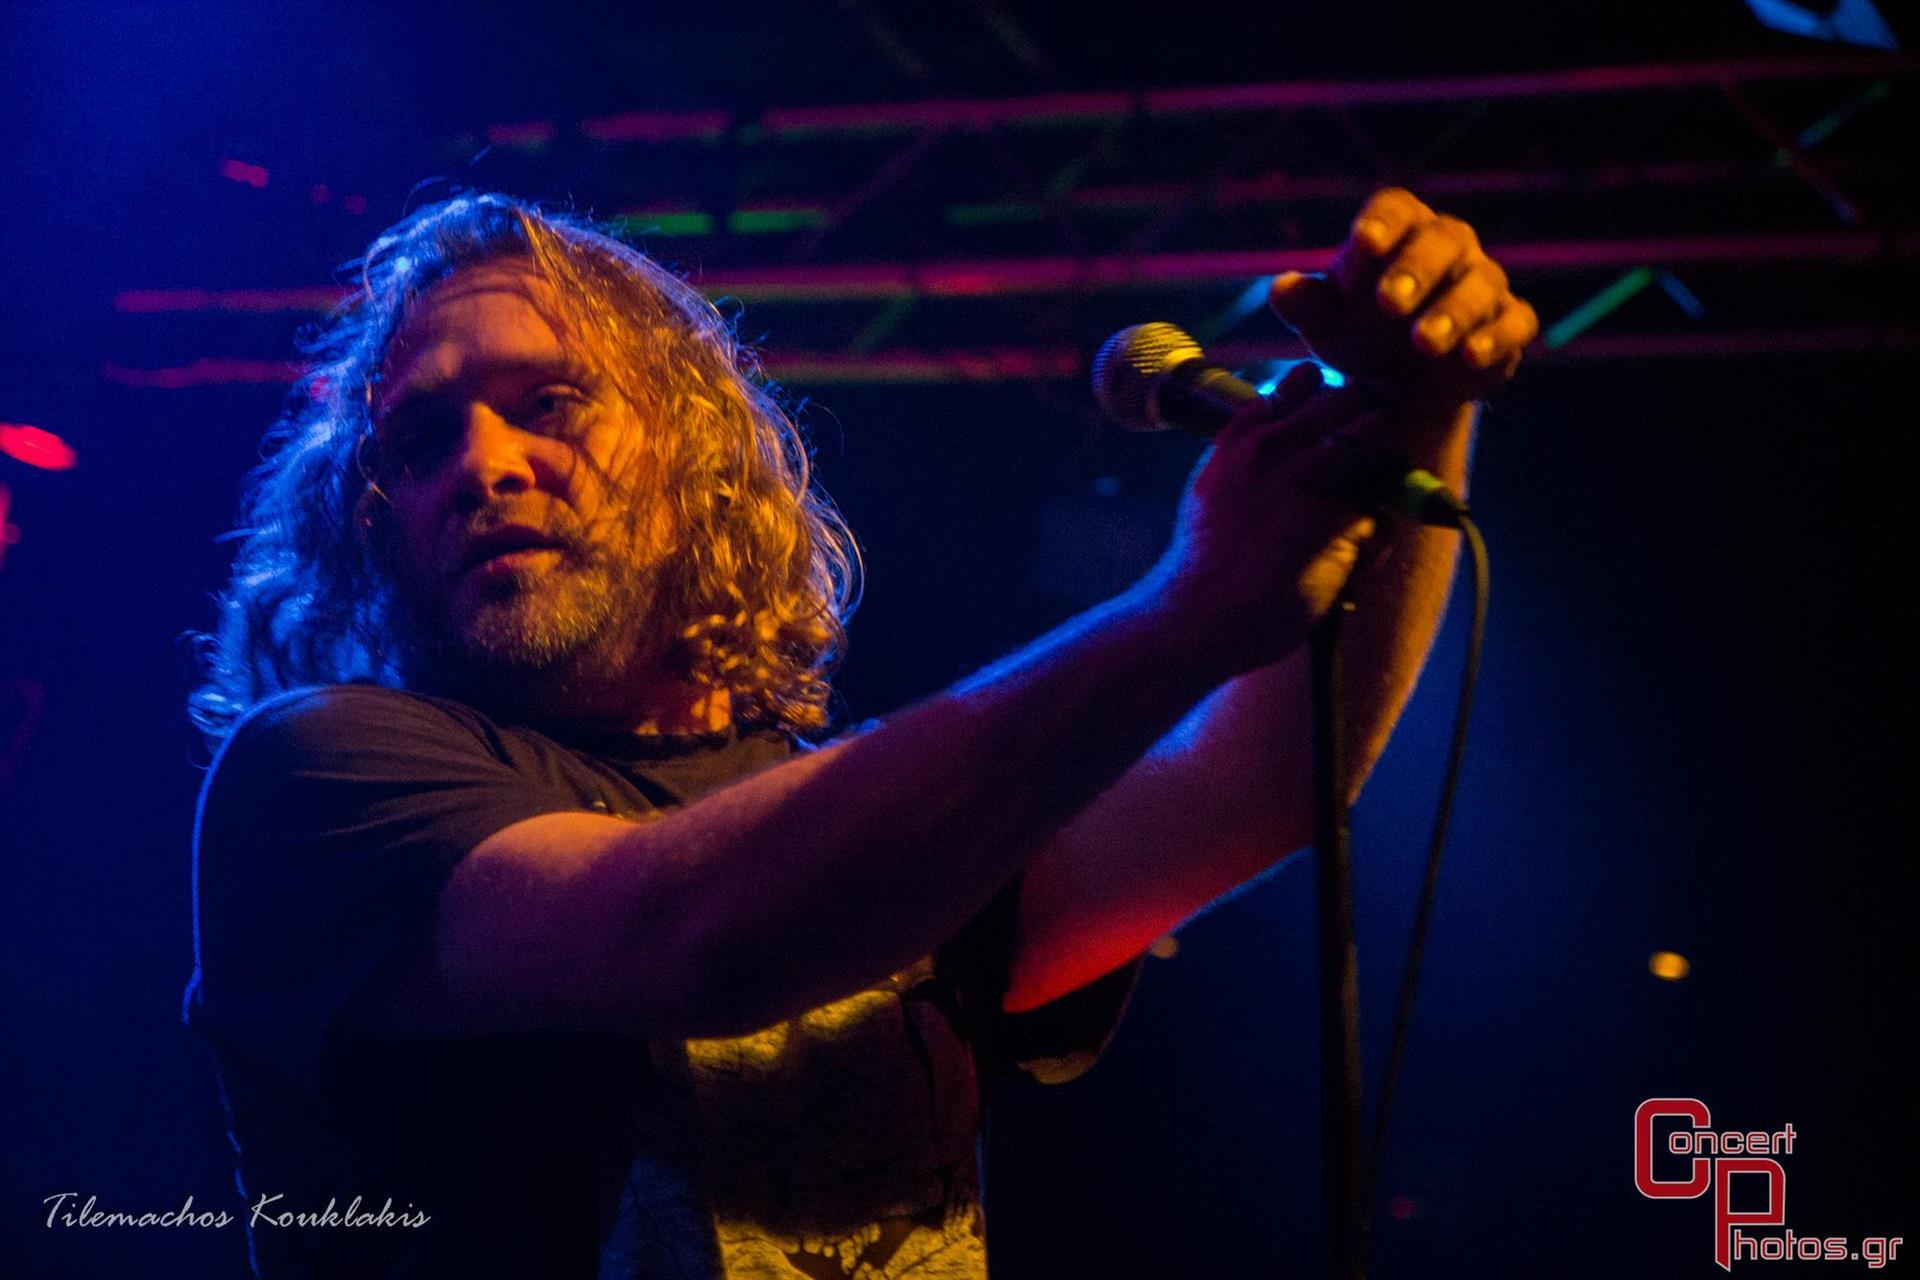 Paul Di Anno -Paul Di Anno  photographer:  - IMG_8552